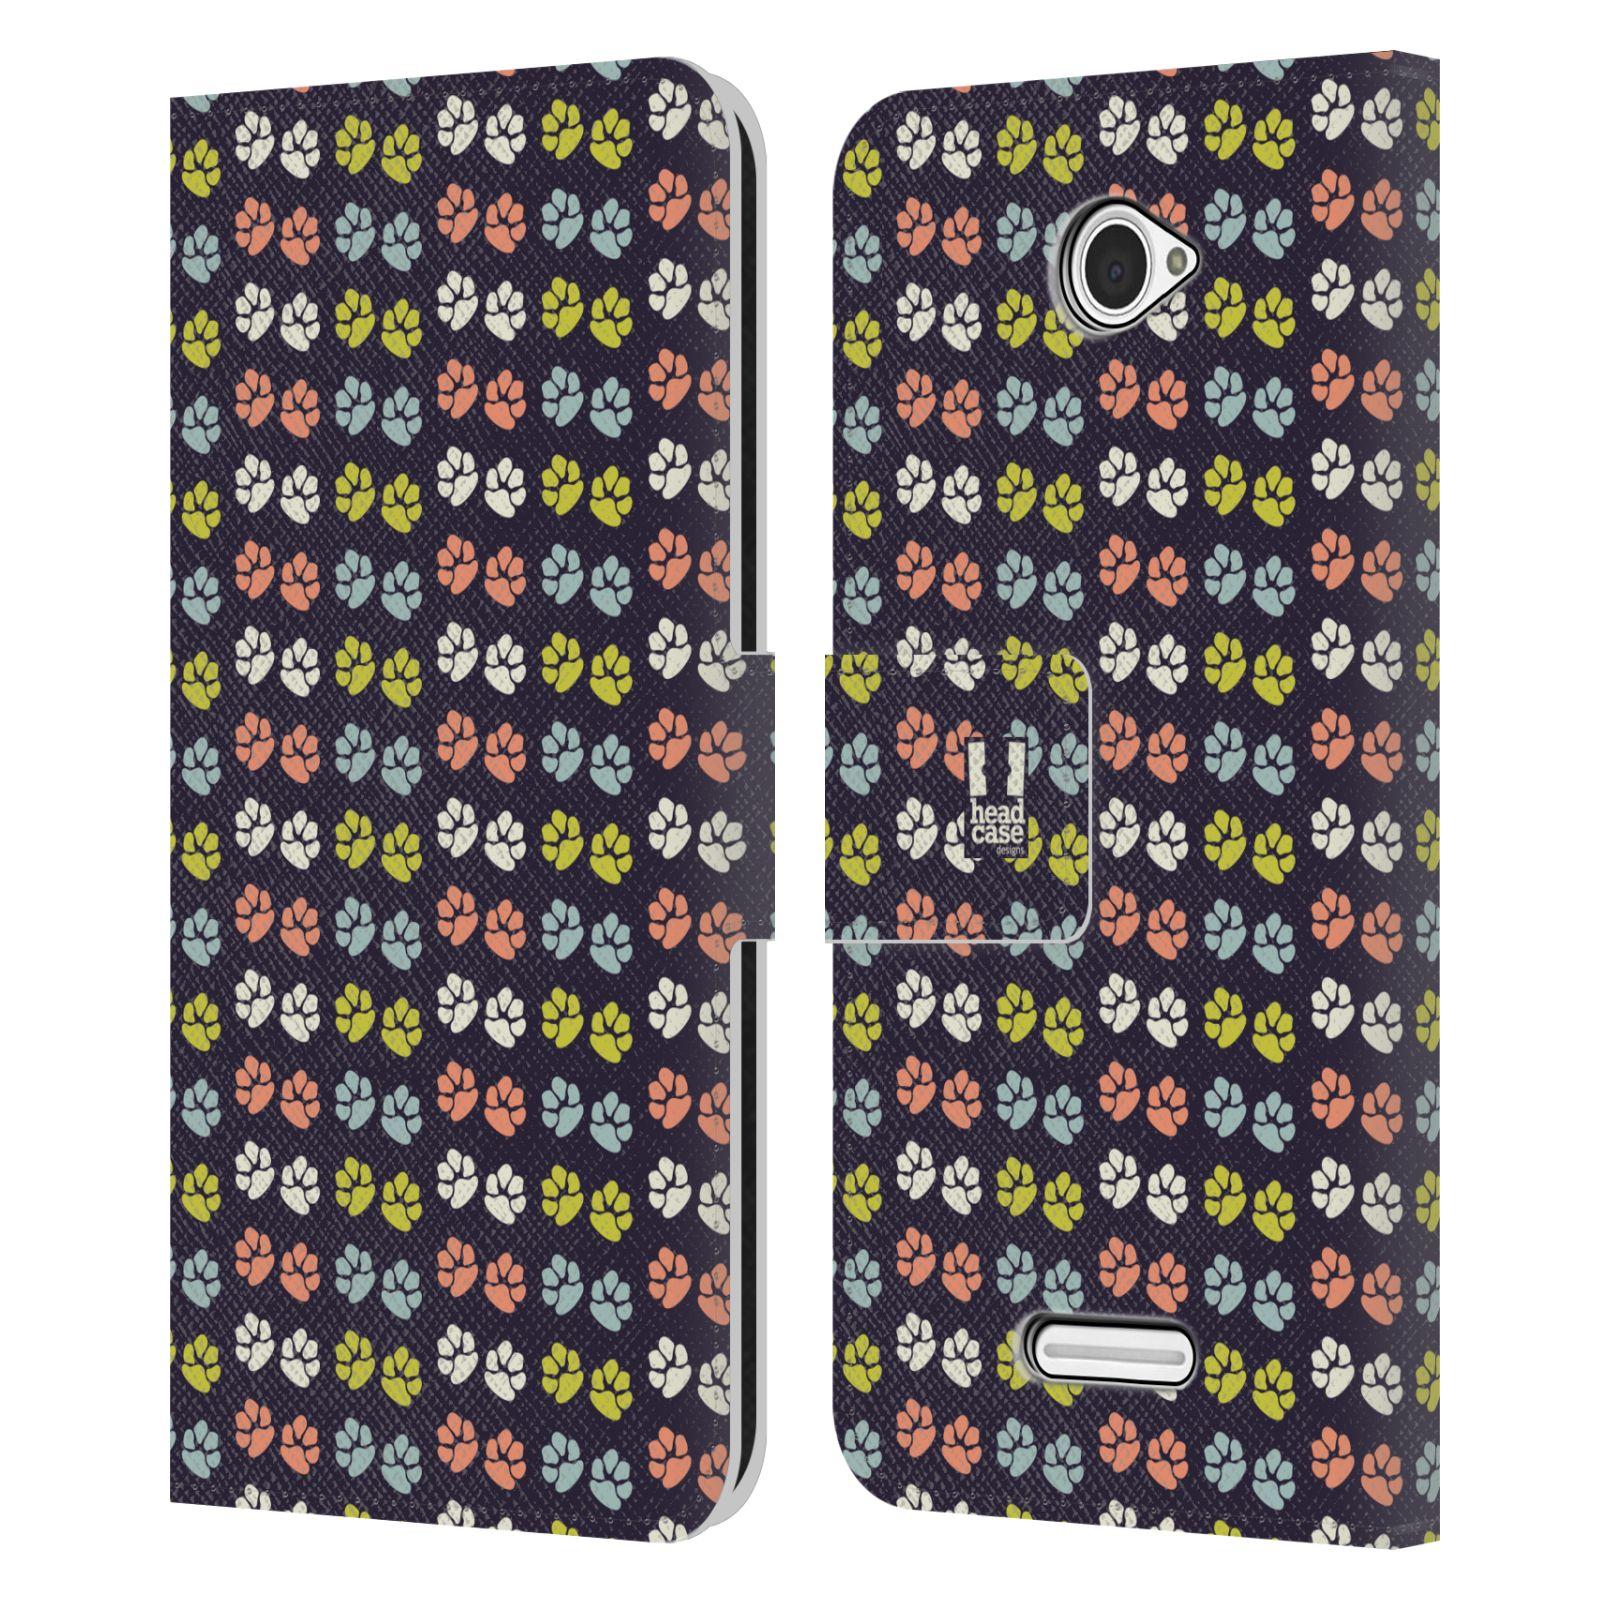 HEAD CASE Flipové pouzdro pro mobil SONY XPERIA E4 Pejsek ťapky barevné RETRO